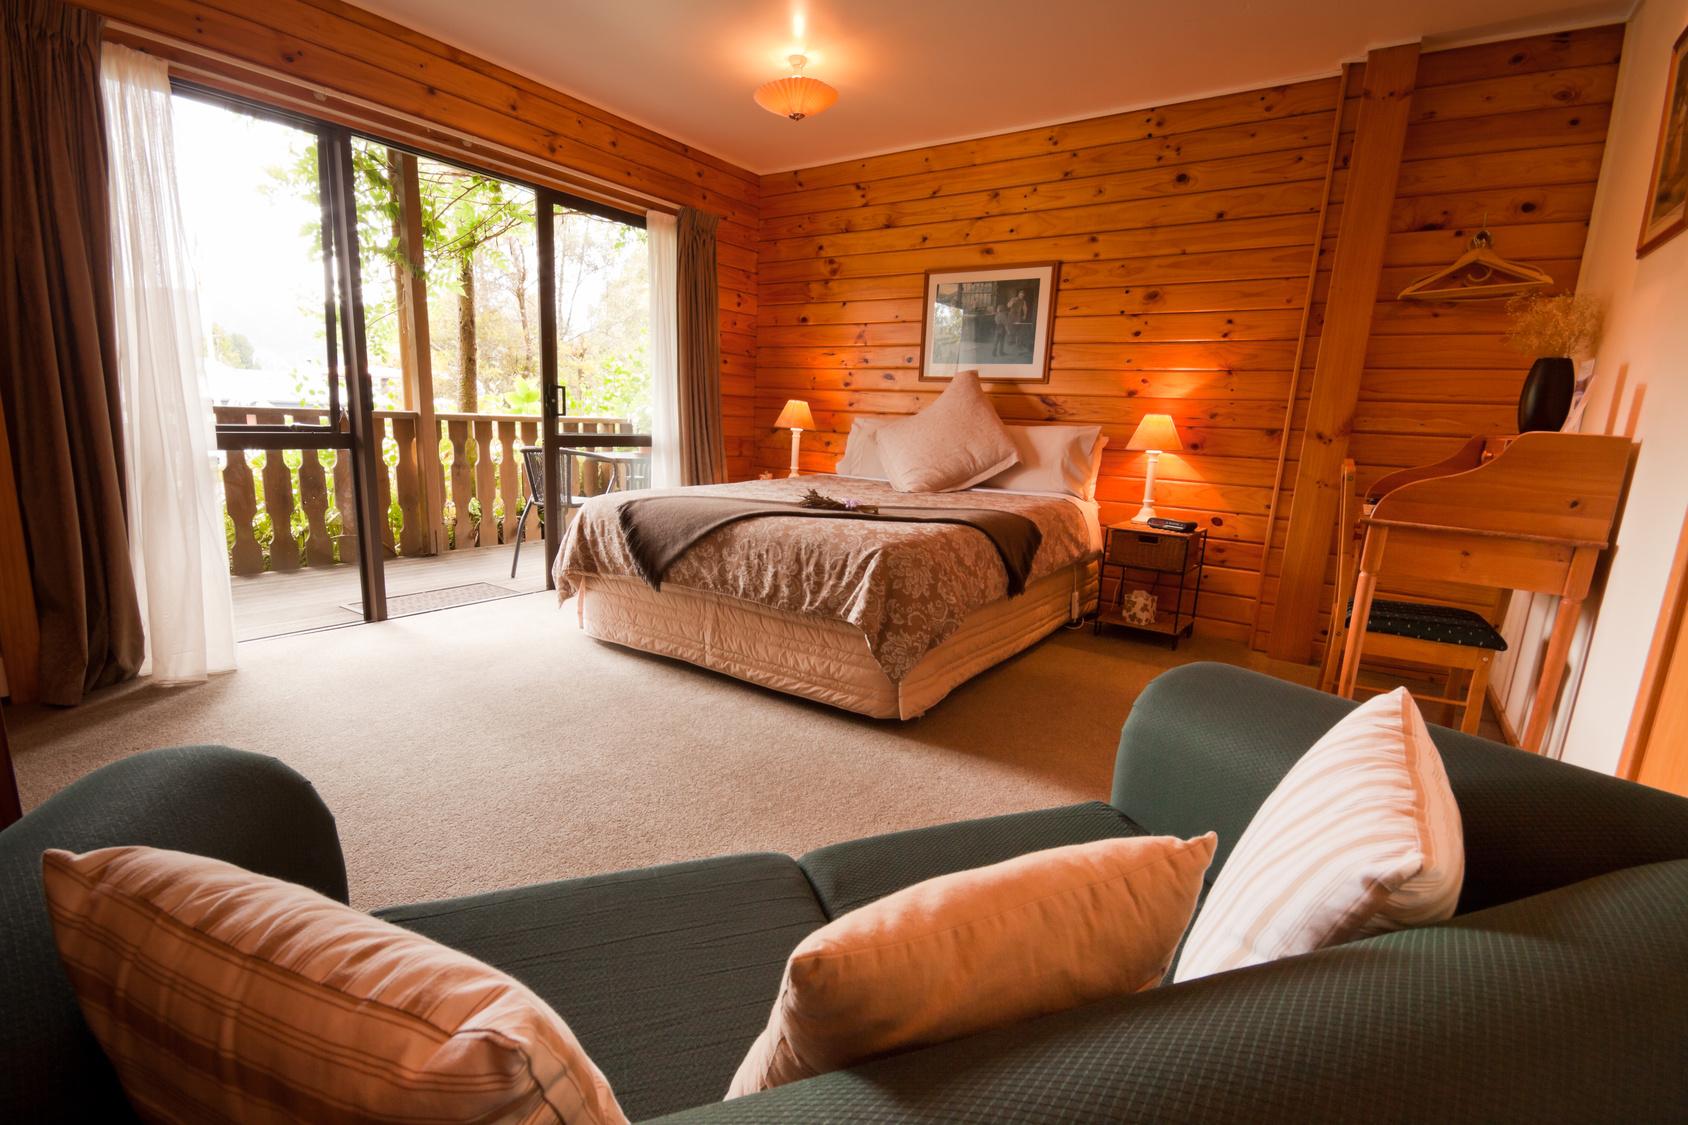 Interior of lodge cabin room